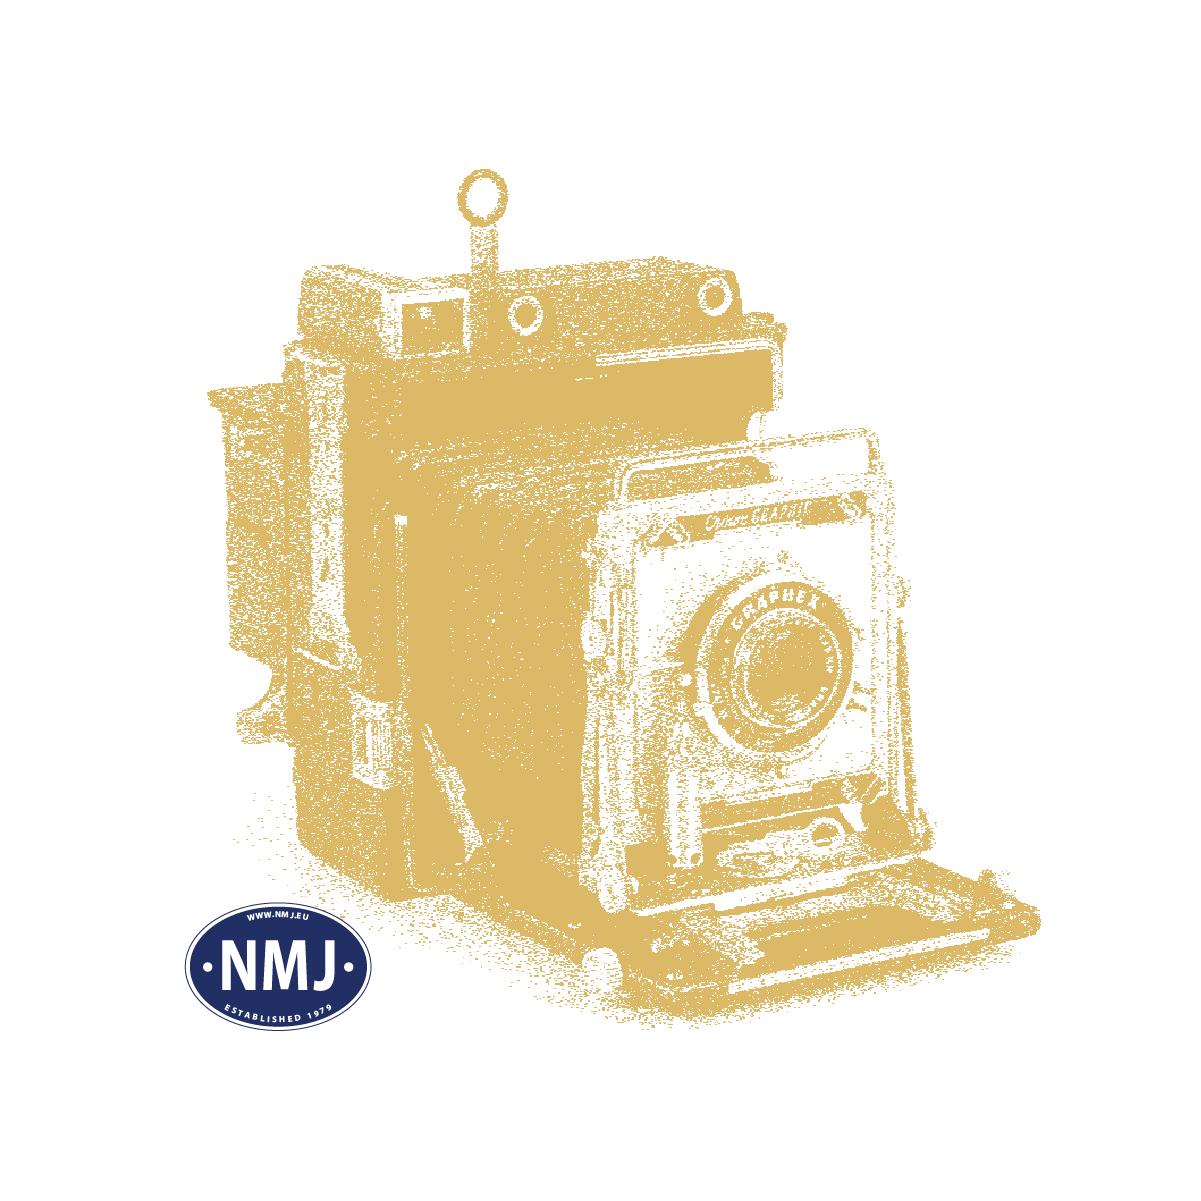 "NMJT90006 - NMJ Topline NSB Di3a.608 ""Nohab"", DCC m/ Sound"